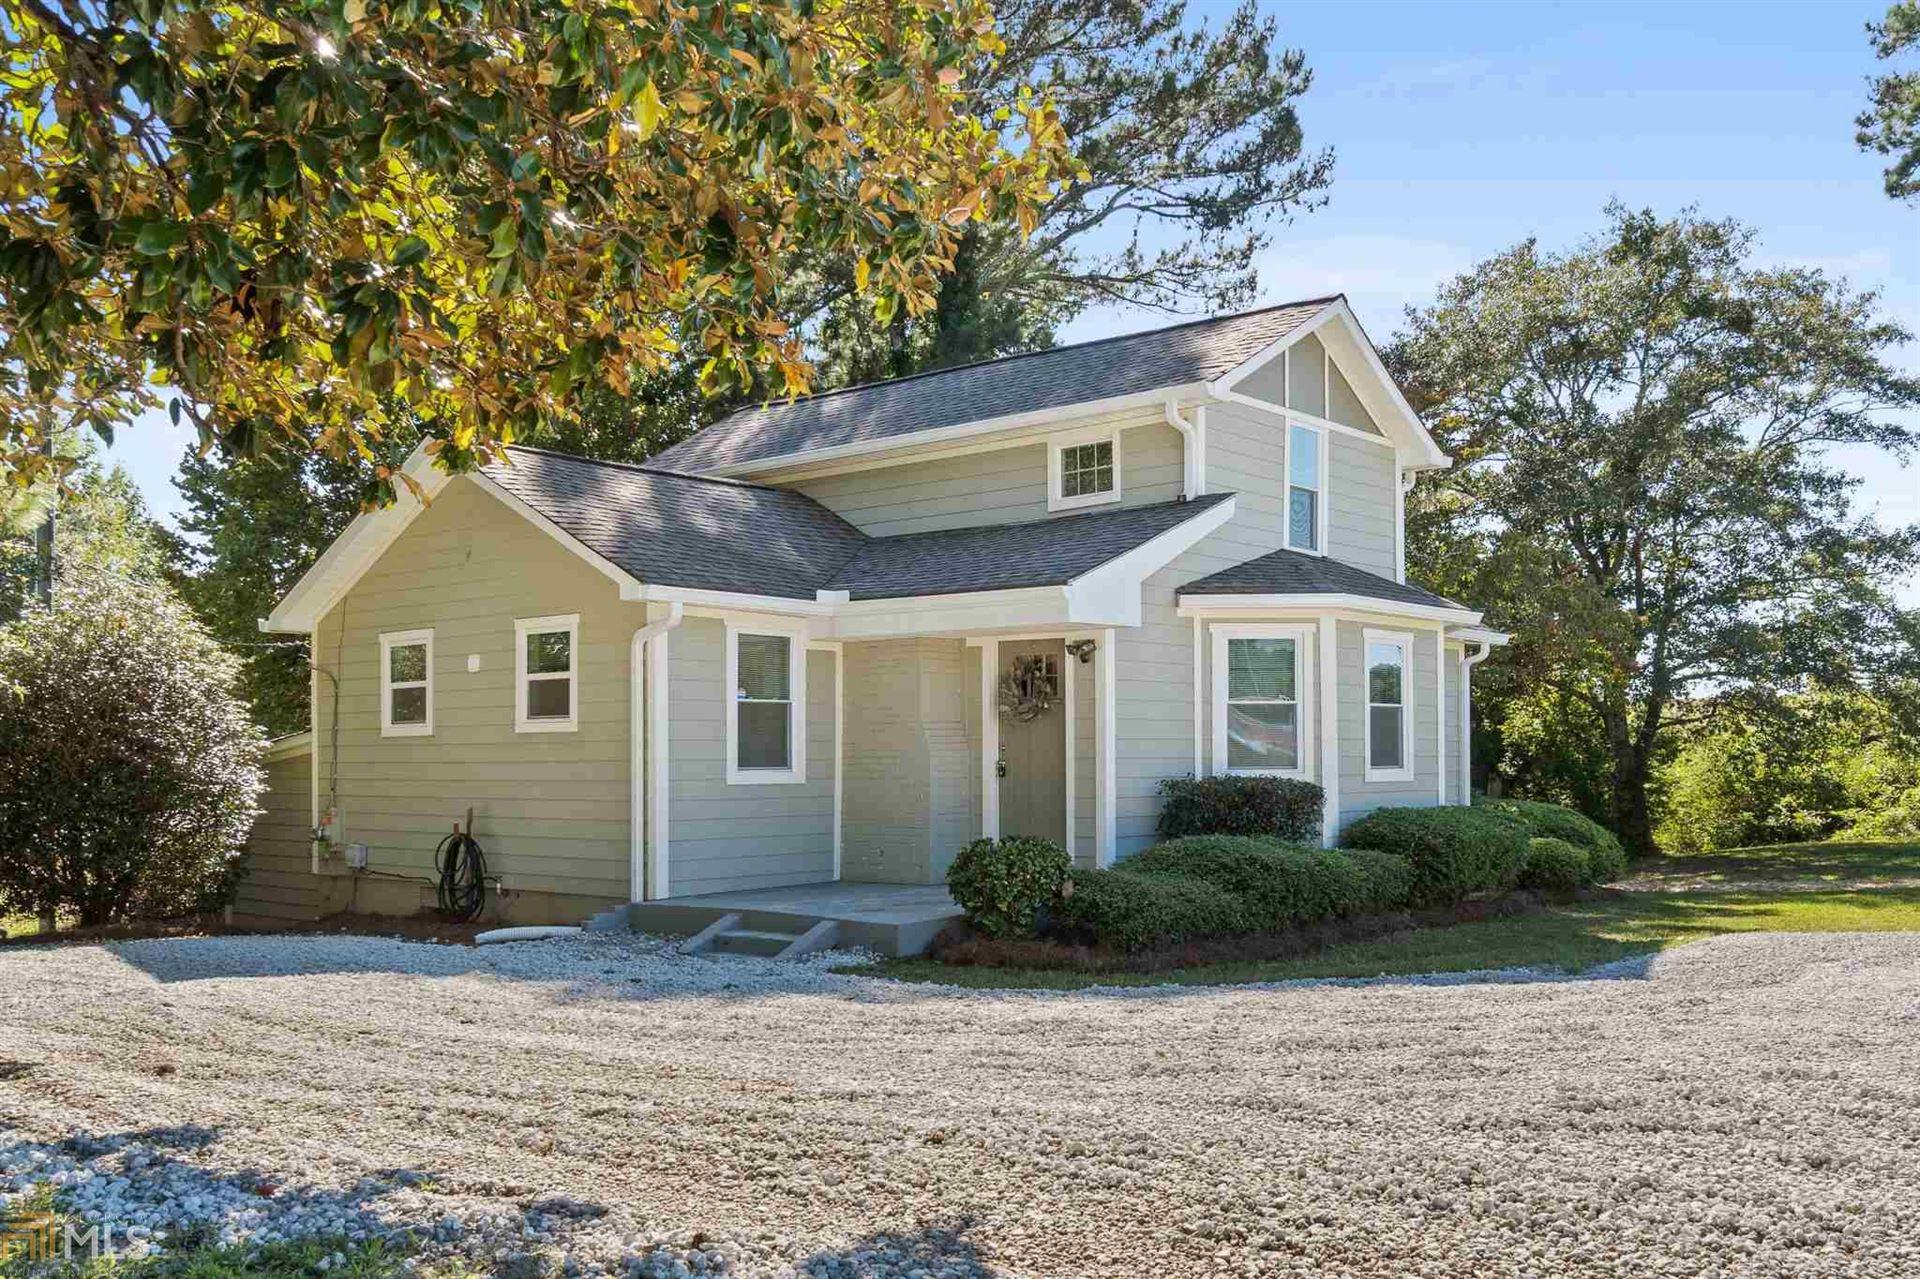 1800 East Lake Rd, McDonough, GA 30252 - MLS#: 8887007